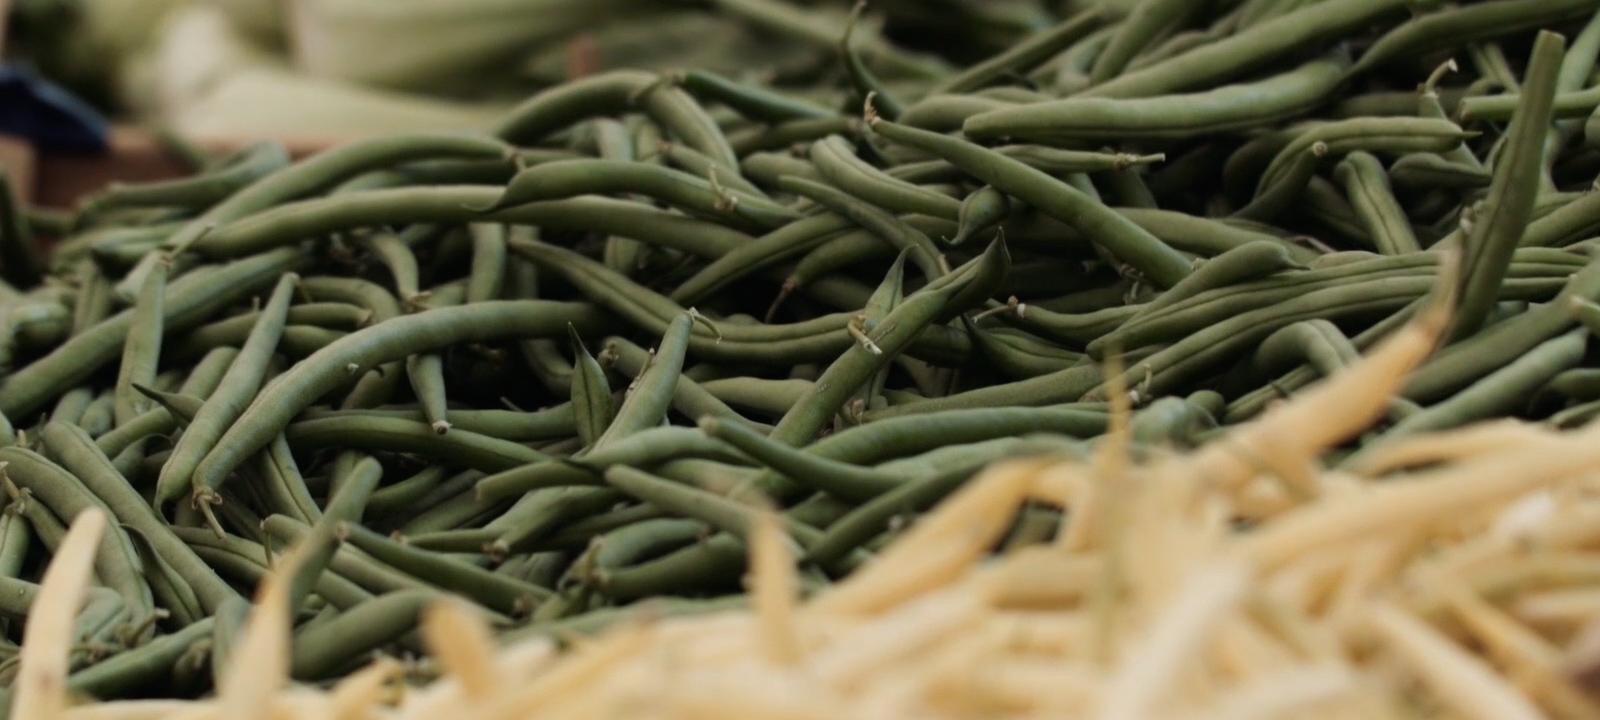 Green beans at a market